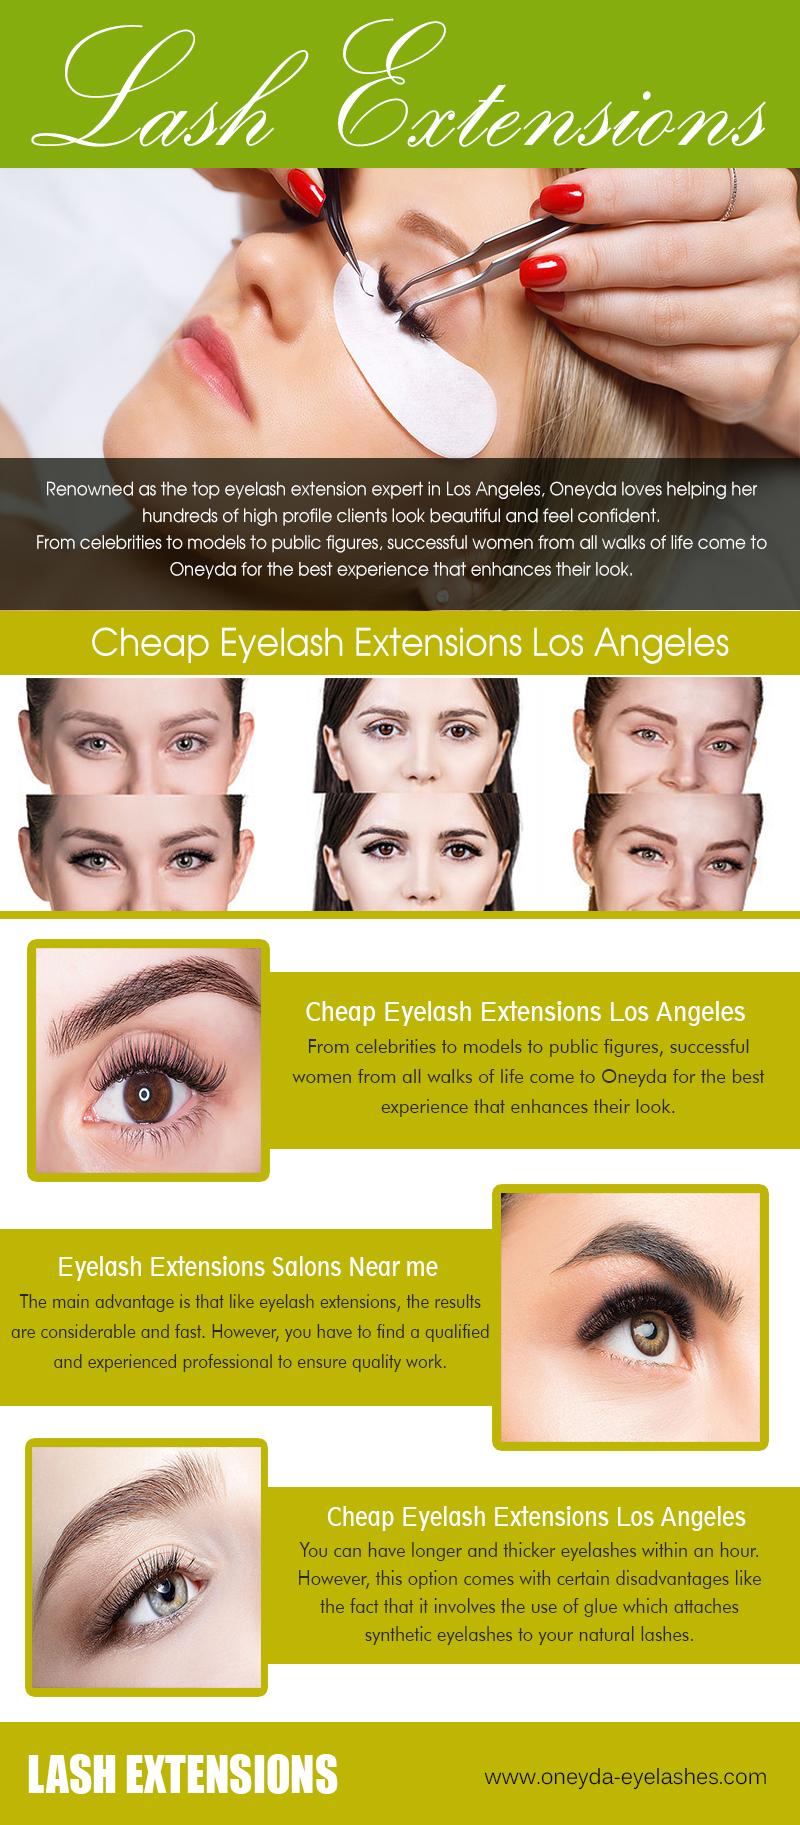 bebcc4d386d Our Website https://www.oneyda-eyelashes.com/ Eyelash extensions